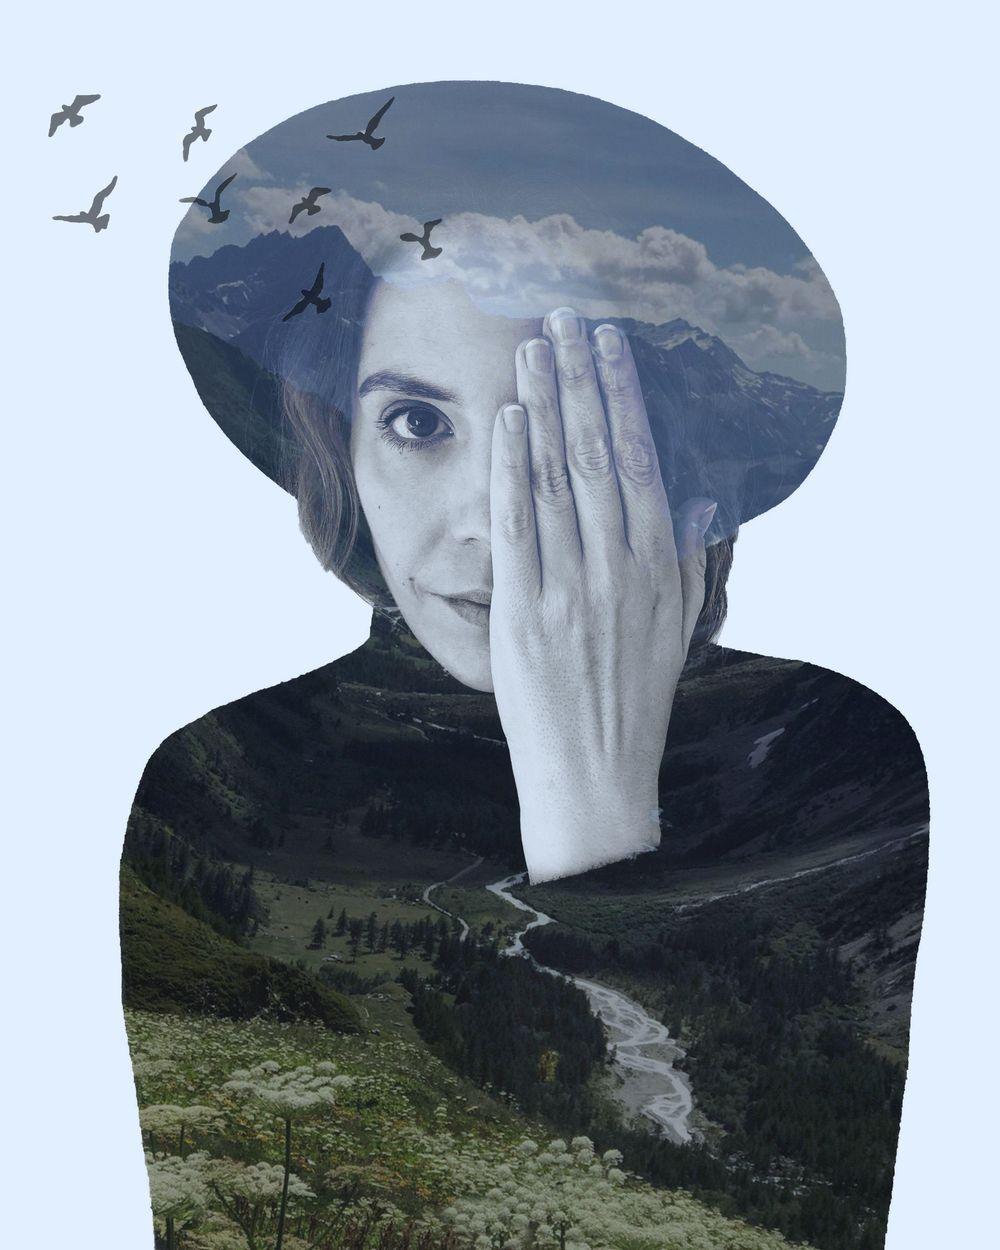 Composite Portrait Examples :) - image 1 - student project